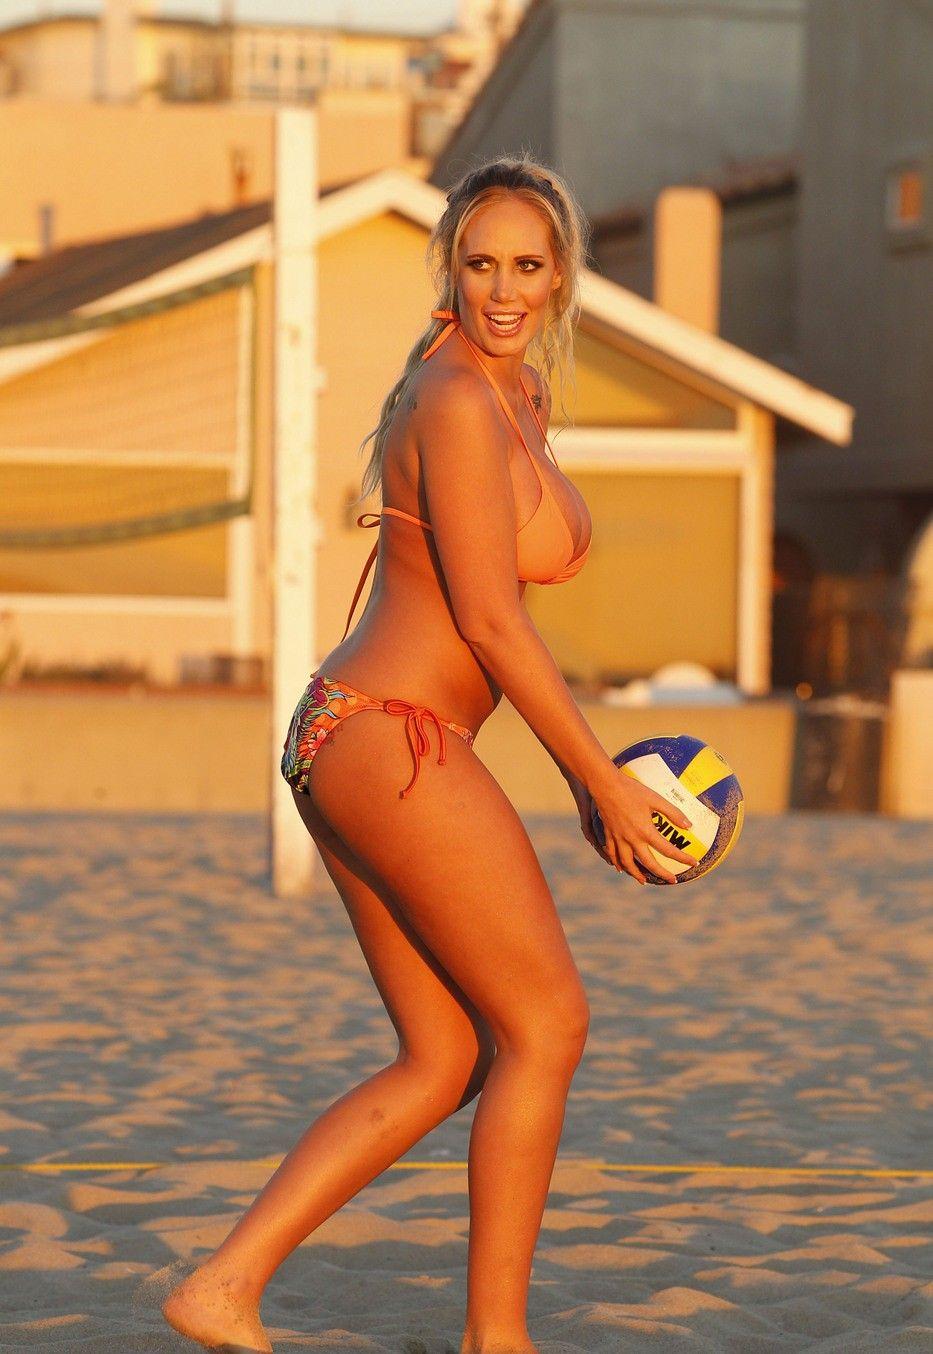 Kirsten dunst leaked nude